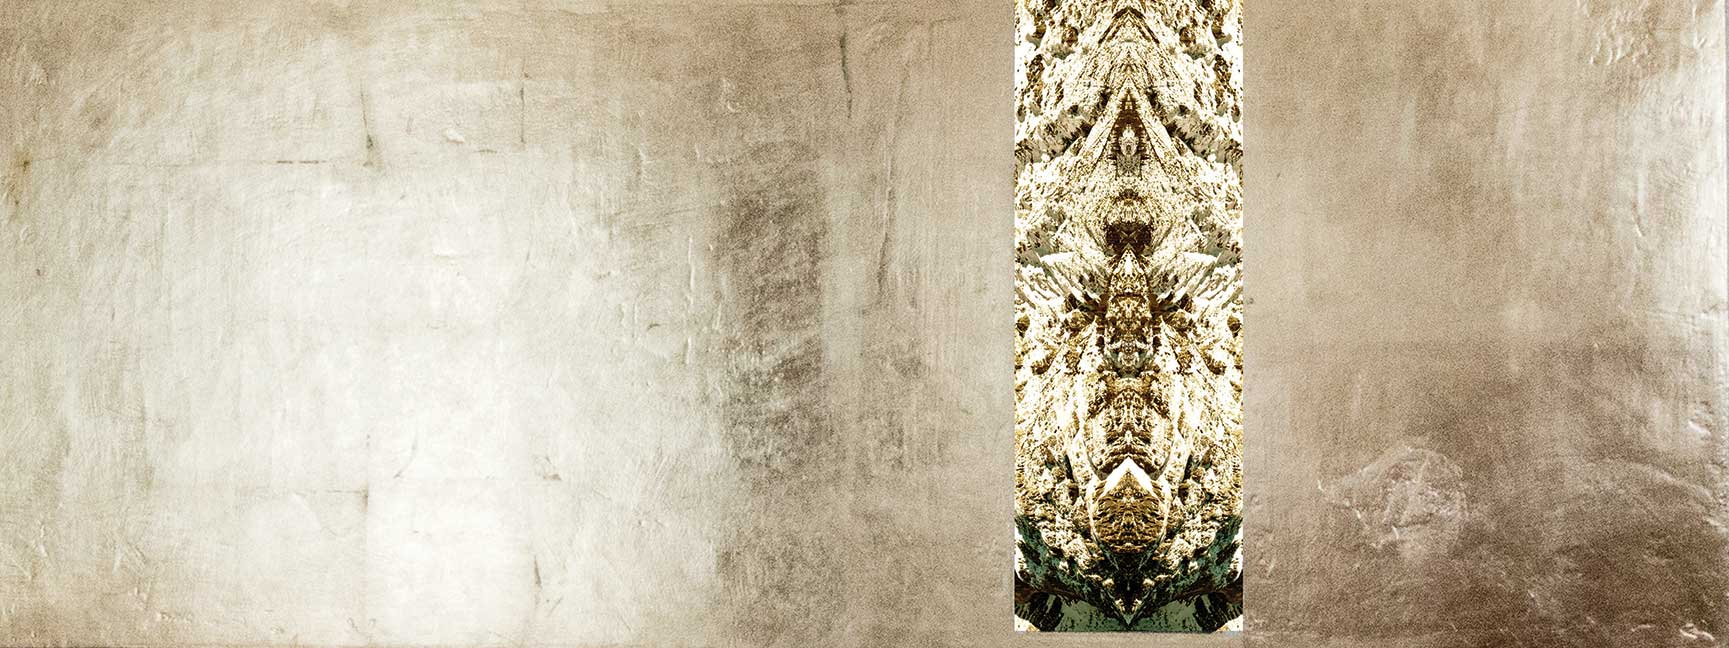 21-Mundewesen-3-160-x-70-cm-Leinwanddruck-mit-Gipsstruktur-vergoldet